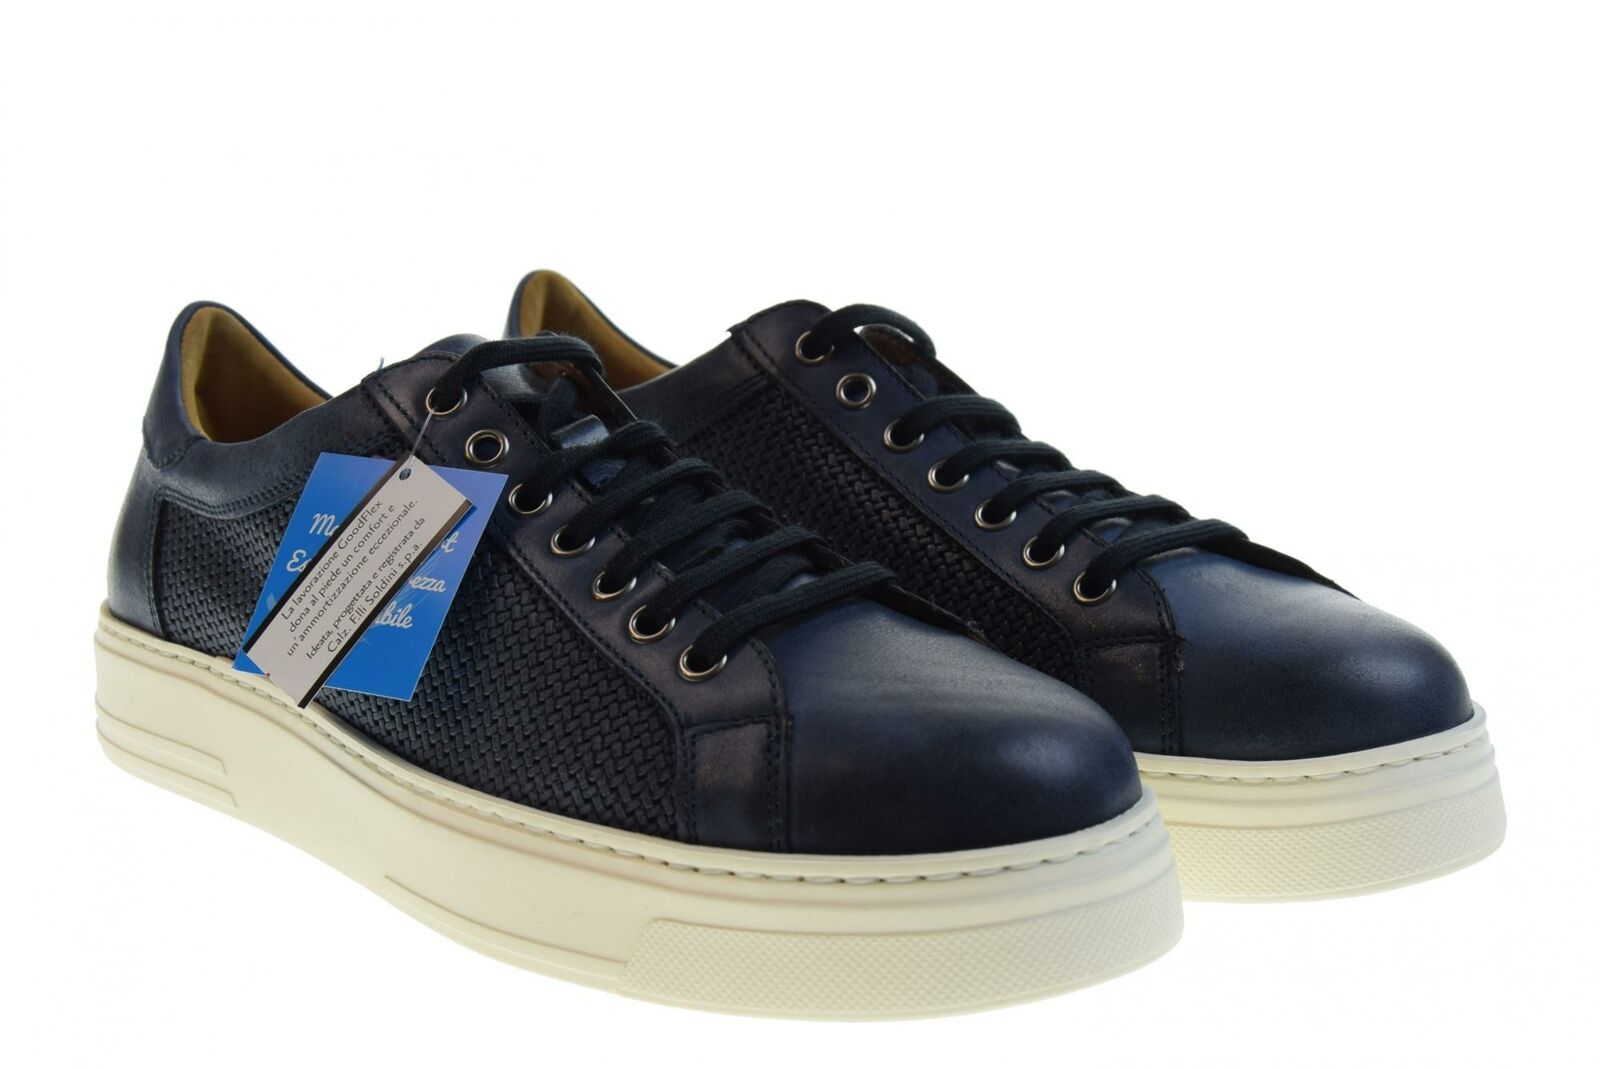 Antica Cuoieria P19s zapatillas bajas 20808-S-V86 KIRA SLAVATO PRINTED blueE